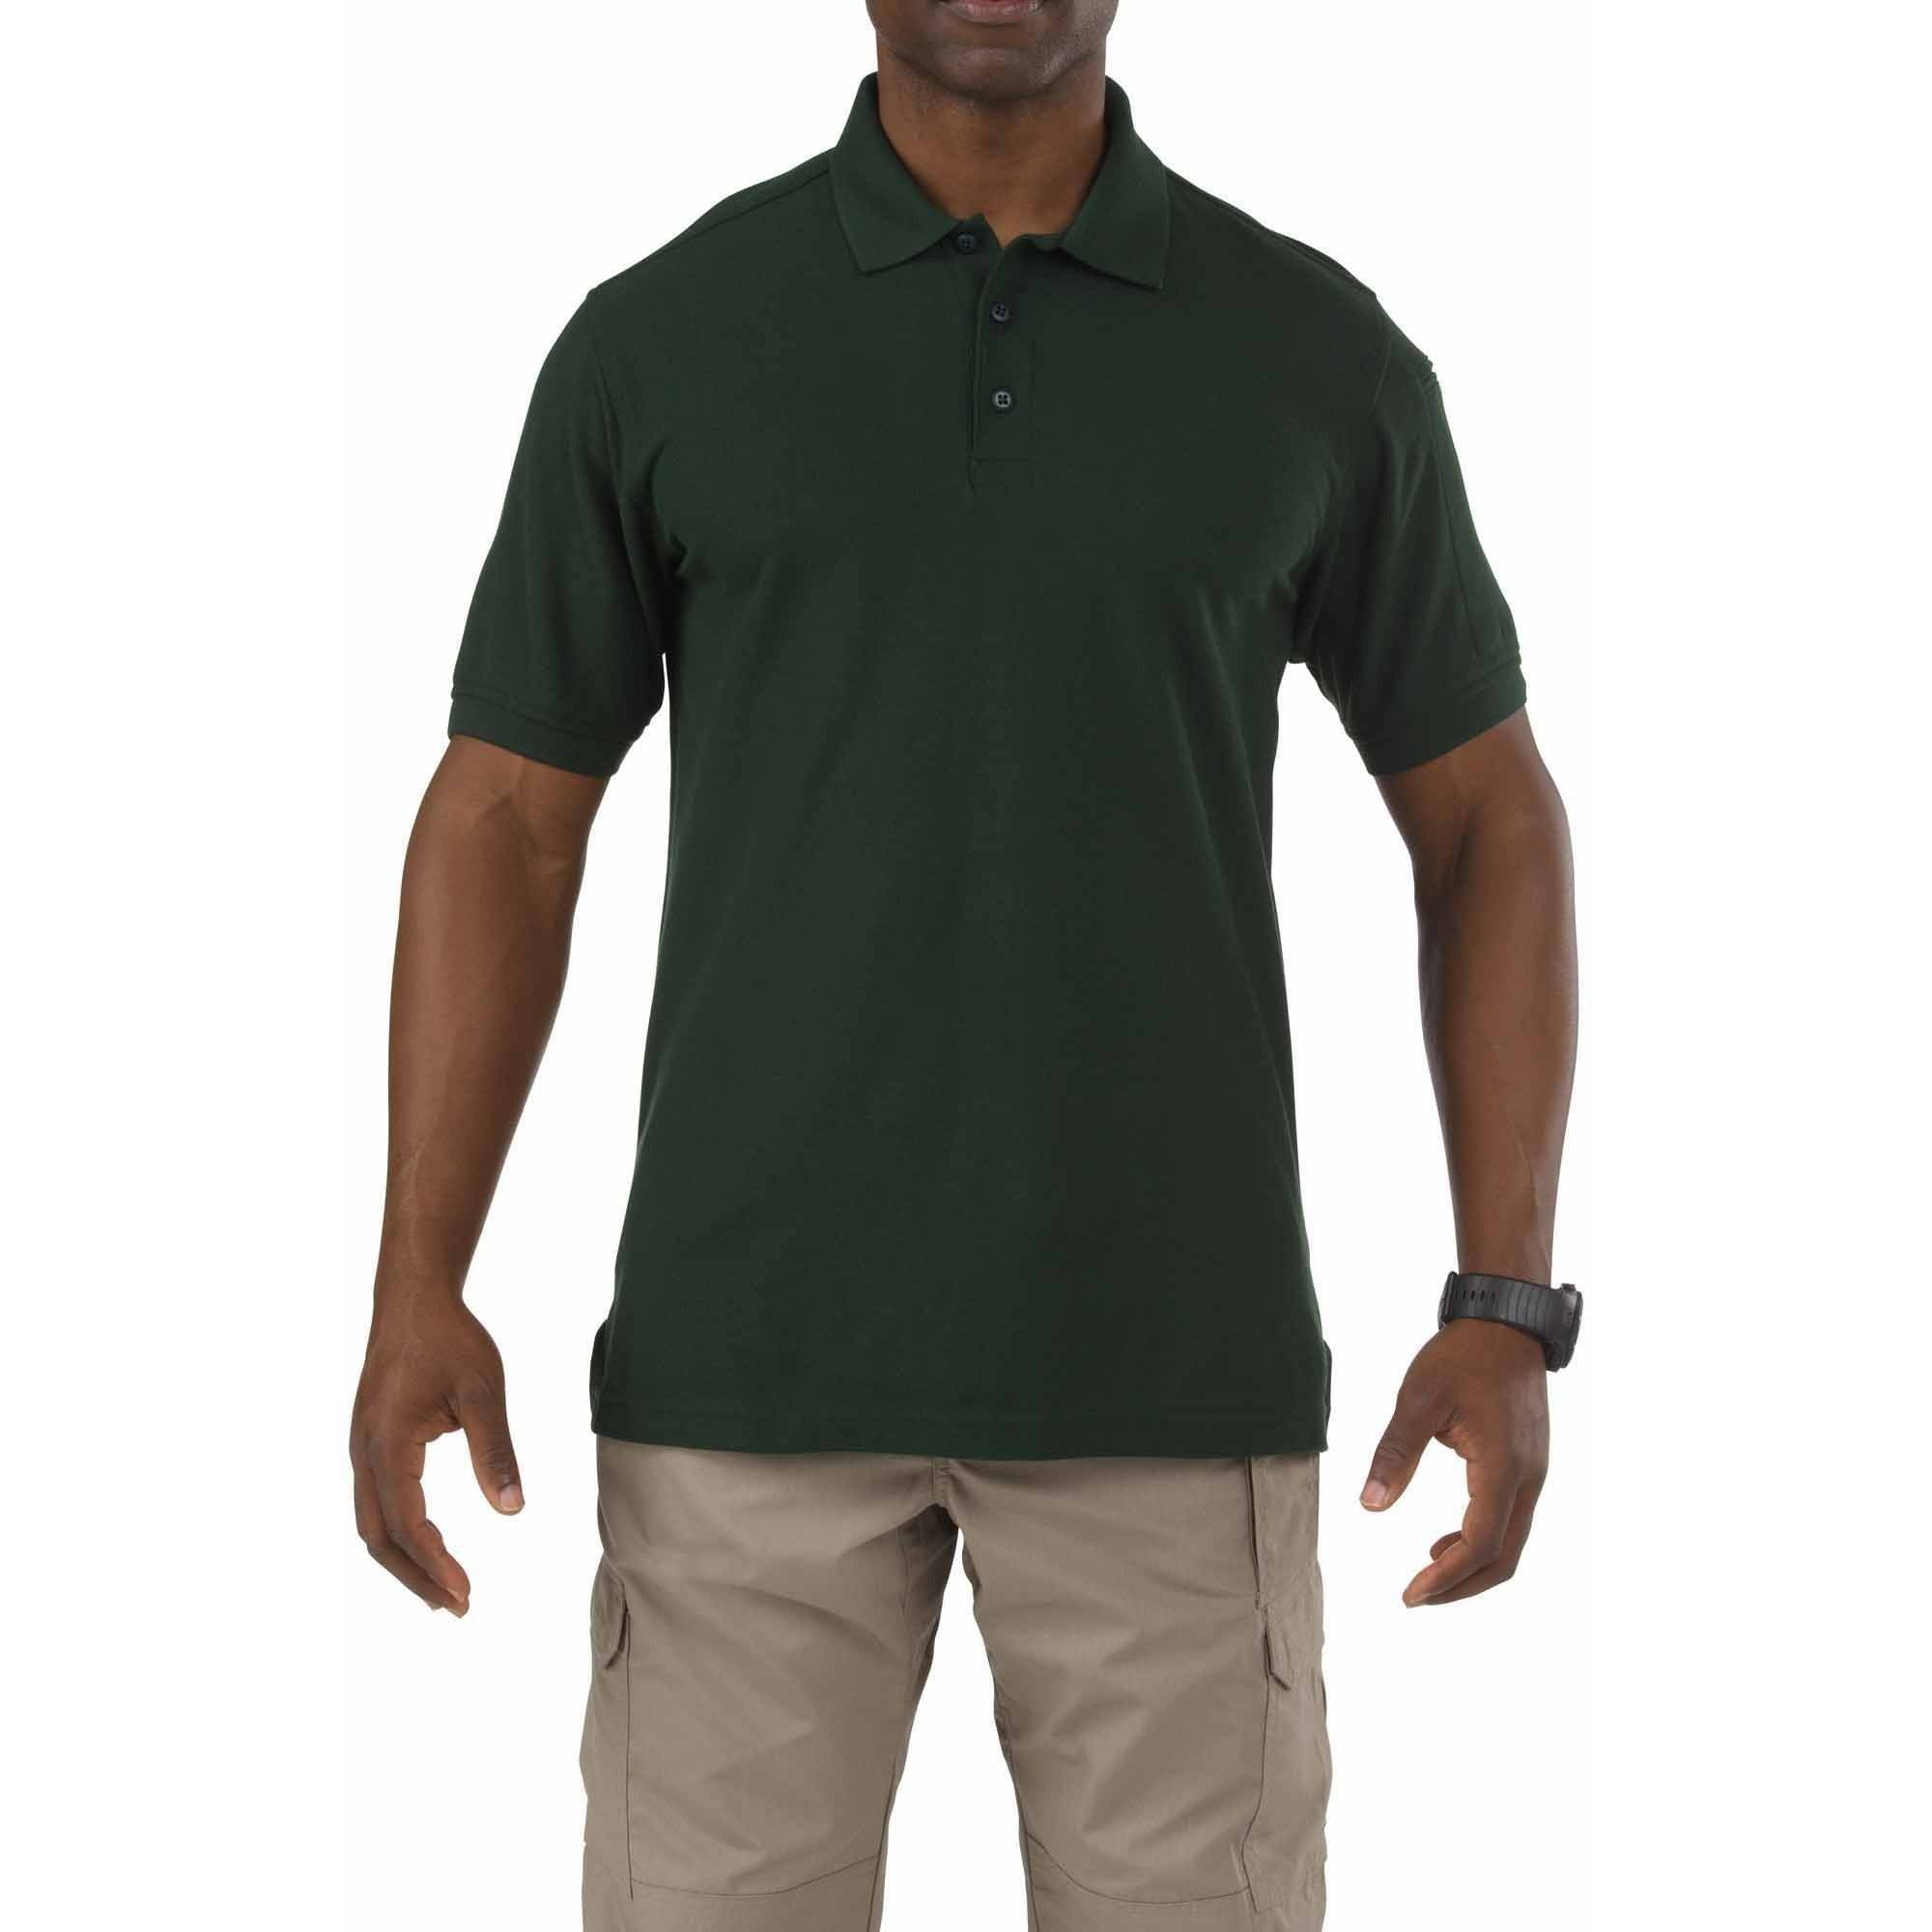 Men Utility Polo Short Sleeve, LE Green, Tall